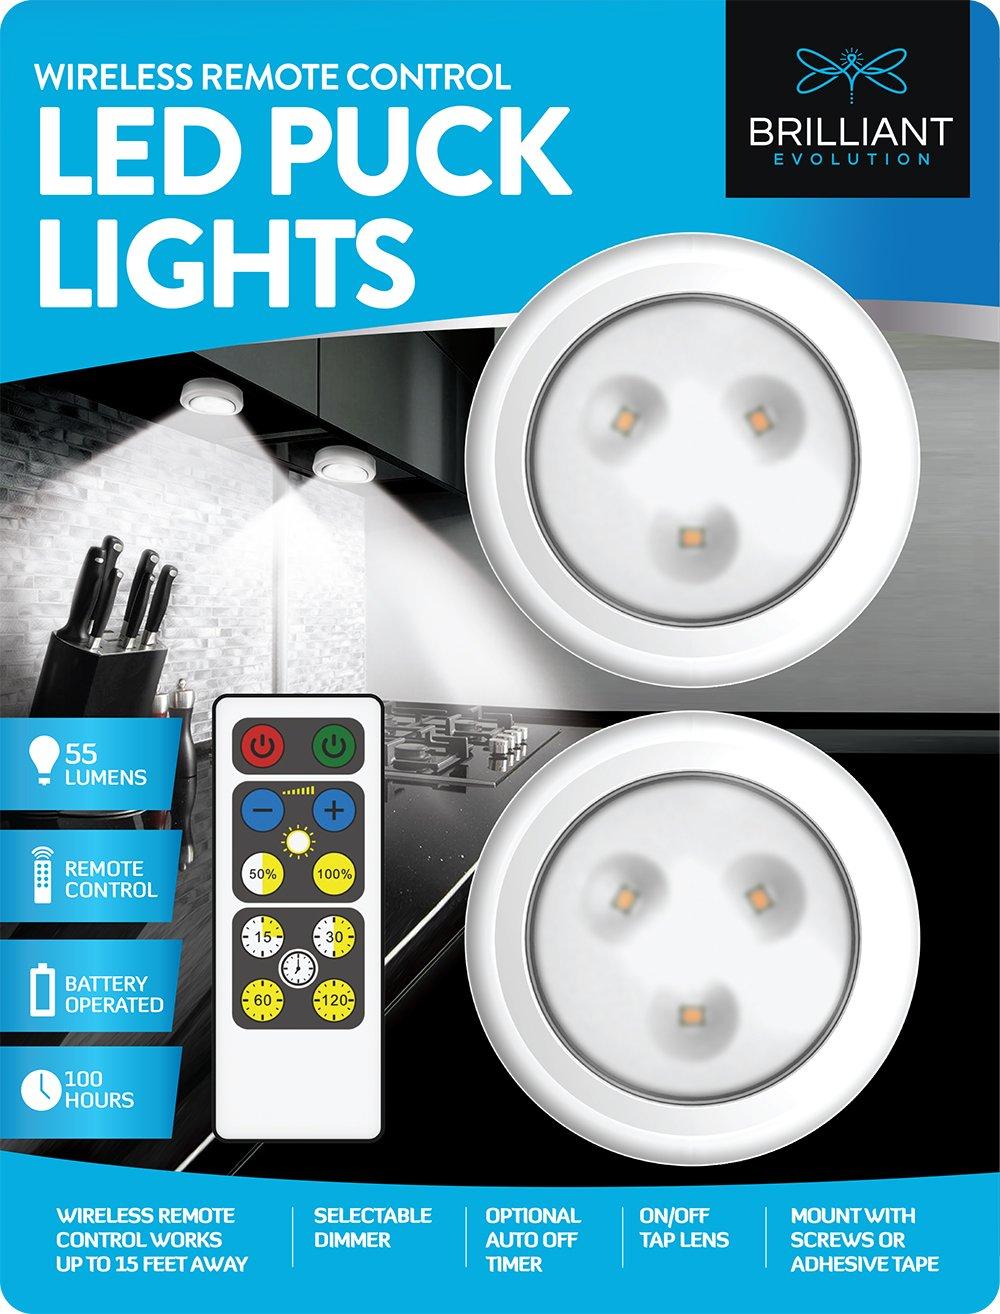 Brilliant Evolution Wireless Remote Control LED Puck Light 2 Pack | LED Under Cabinet Lighting | Closet Light | Battery Powered Lights | Under Counter Lighting | Stick On Lights by Brilliant Evolution